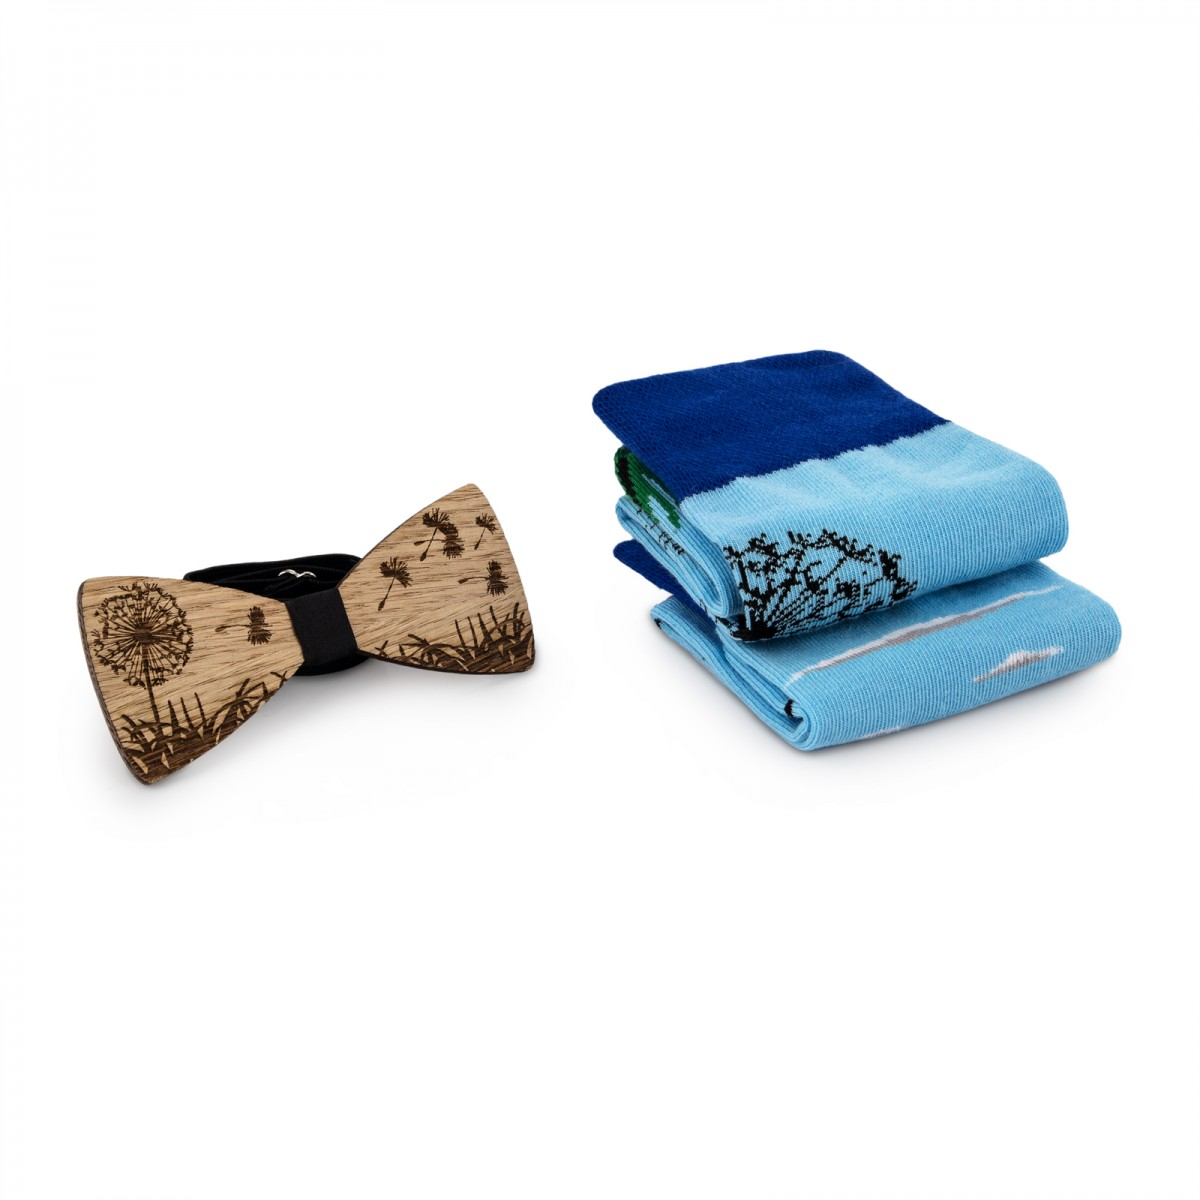 Skarpety i drewniana mucha - zestaw - model Dmuchawiec